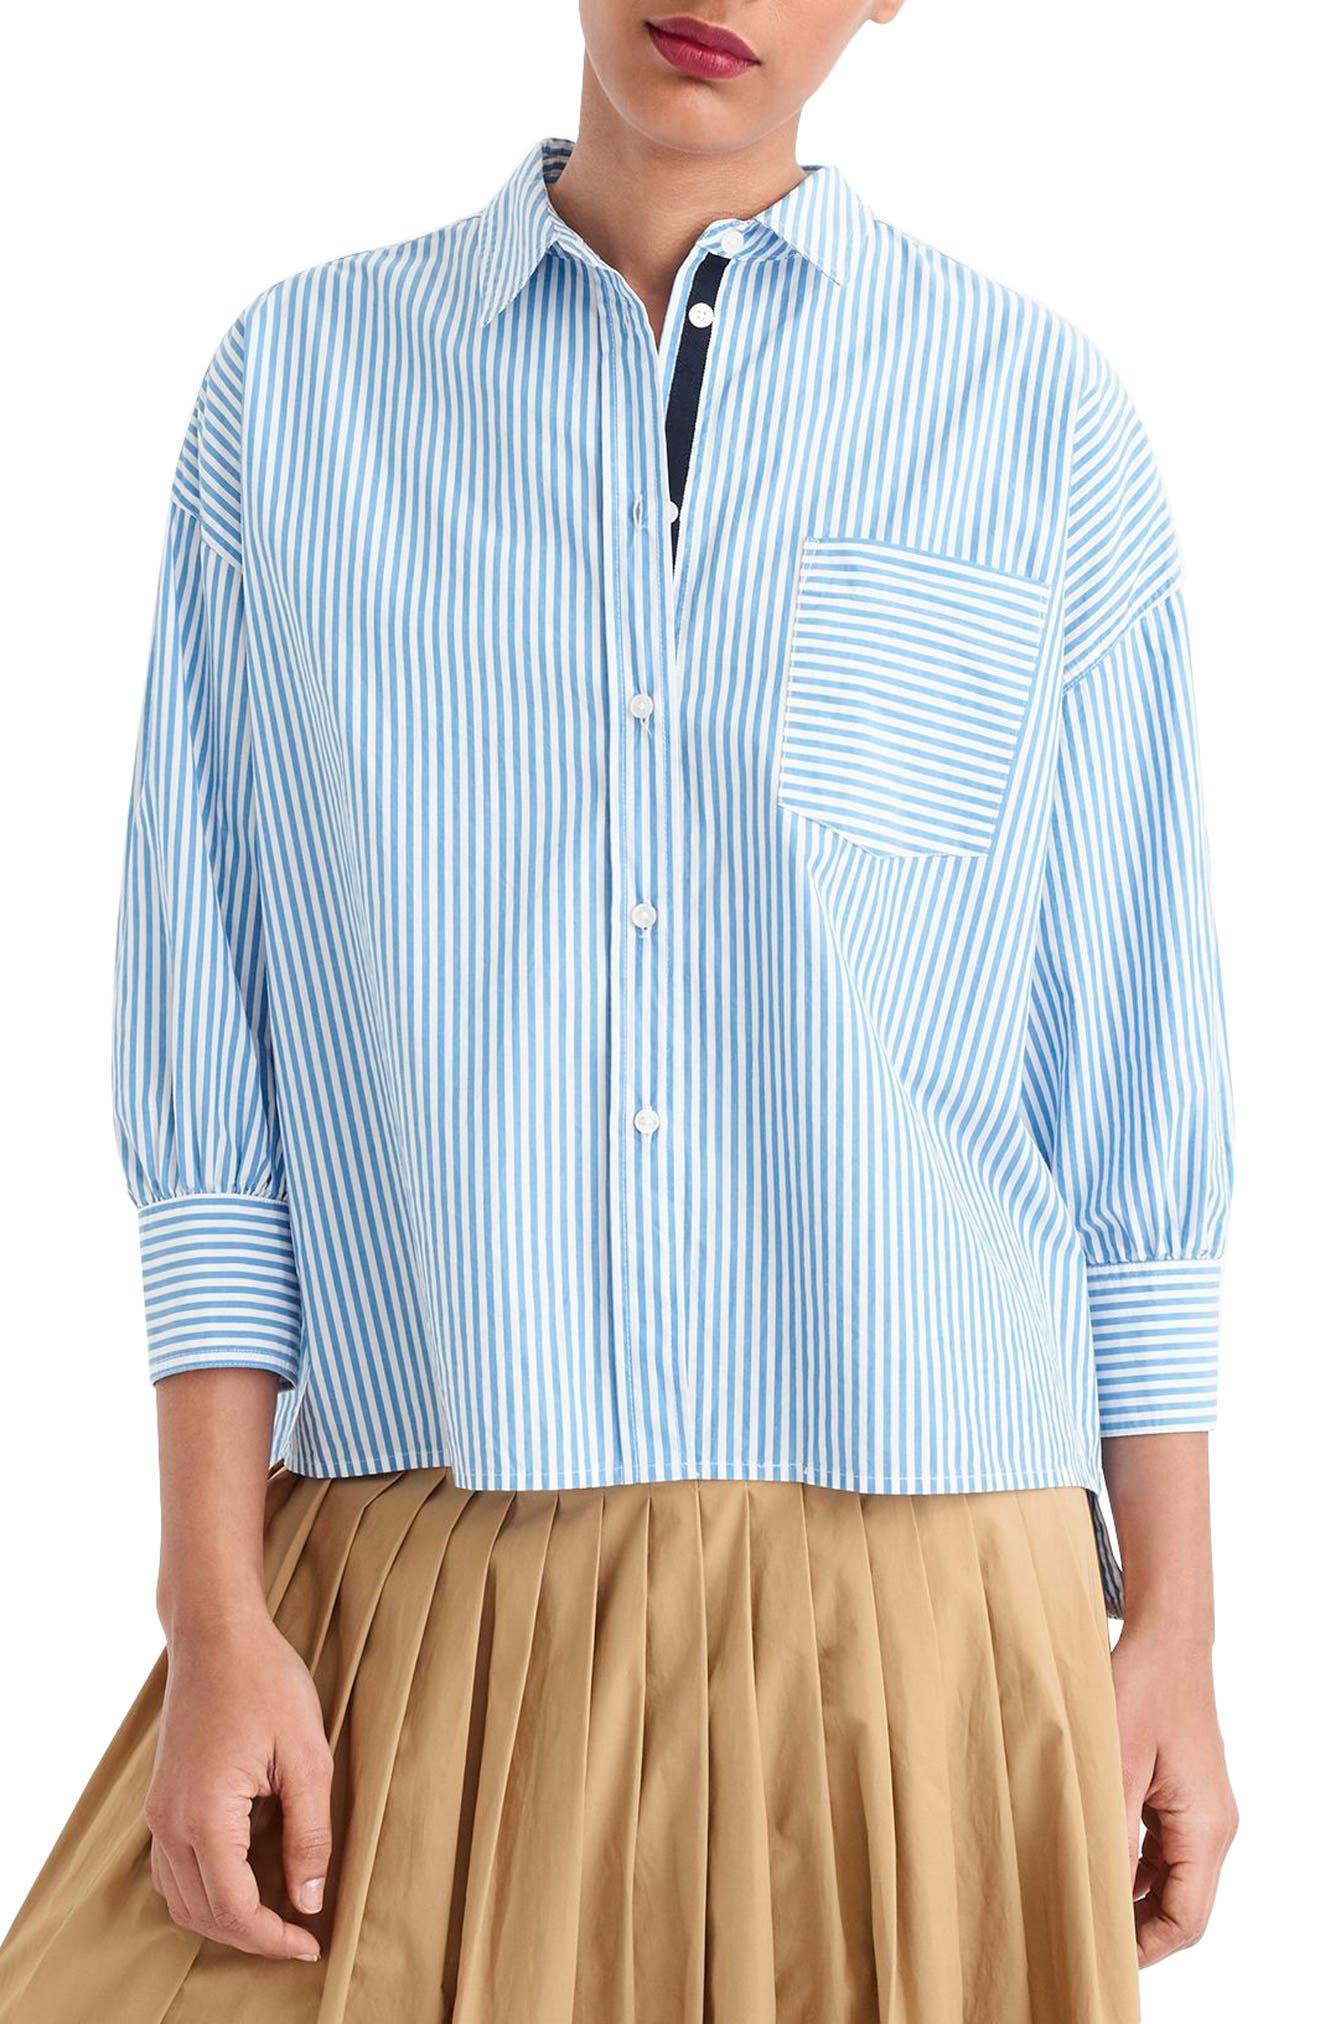 Fieer Mens Casual Striped Oversize Juniors Button Down Shirt